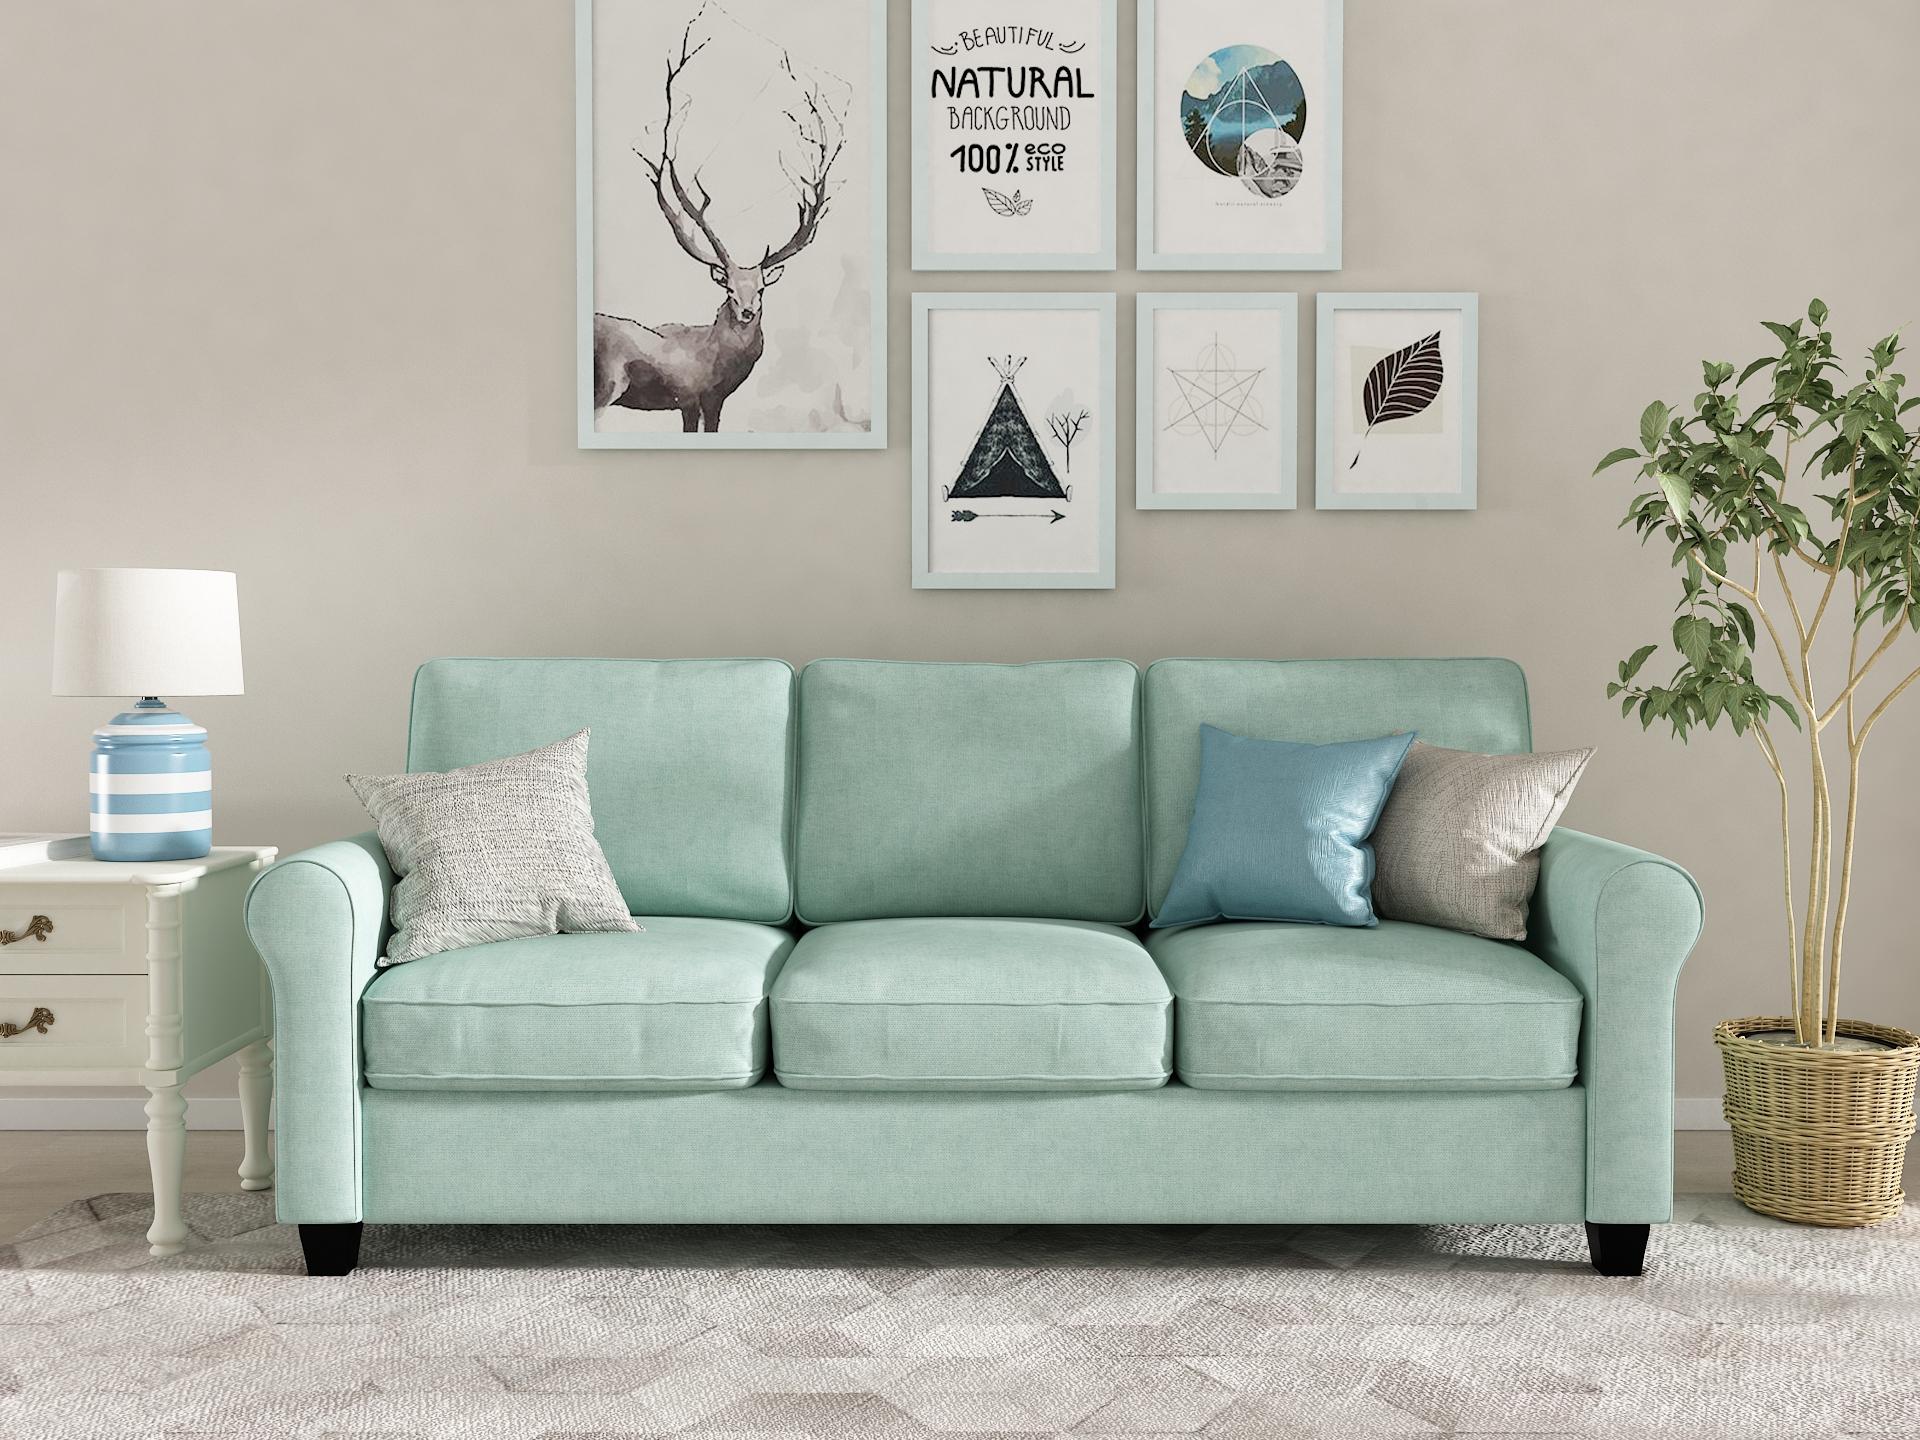 Queenshome Modern Wooden Sofa Cama